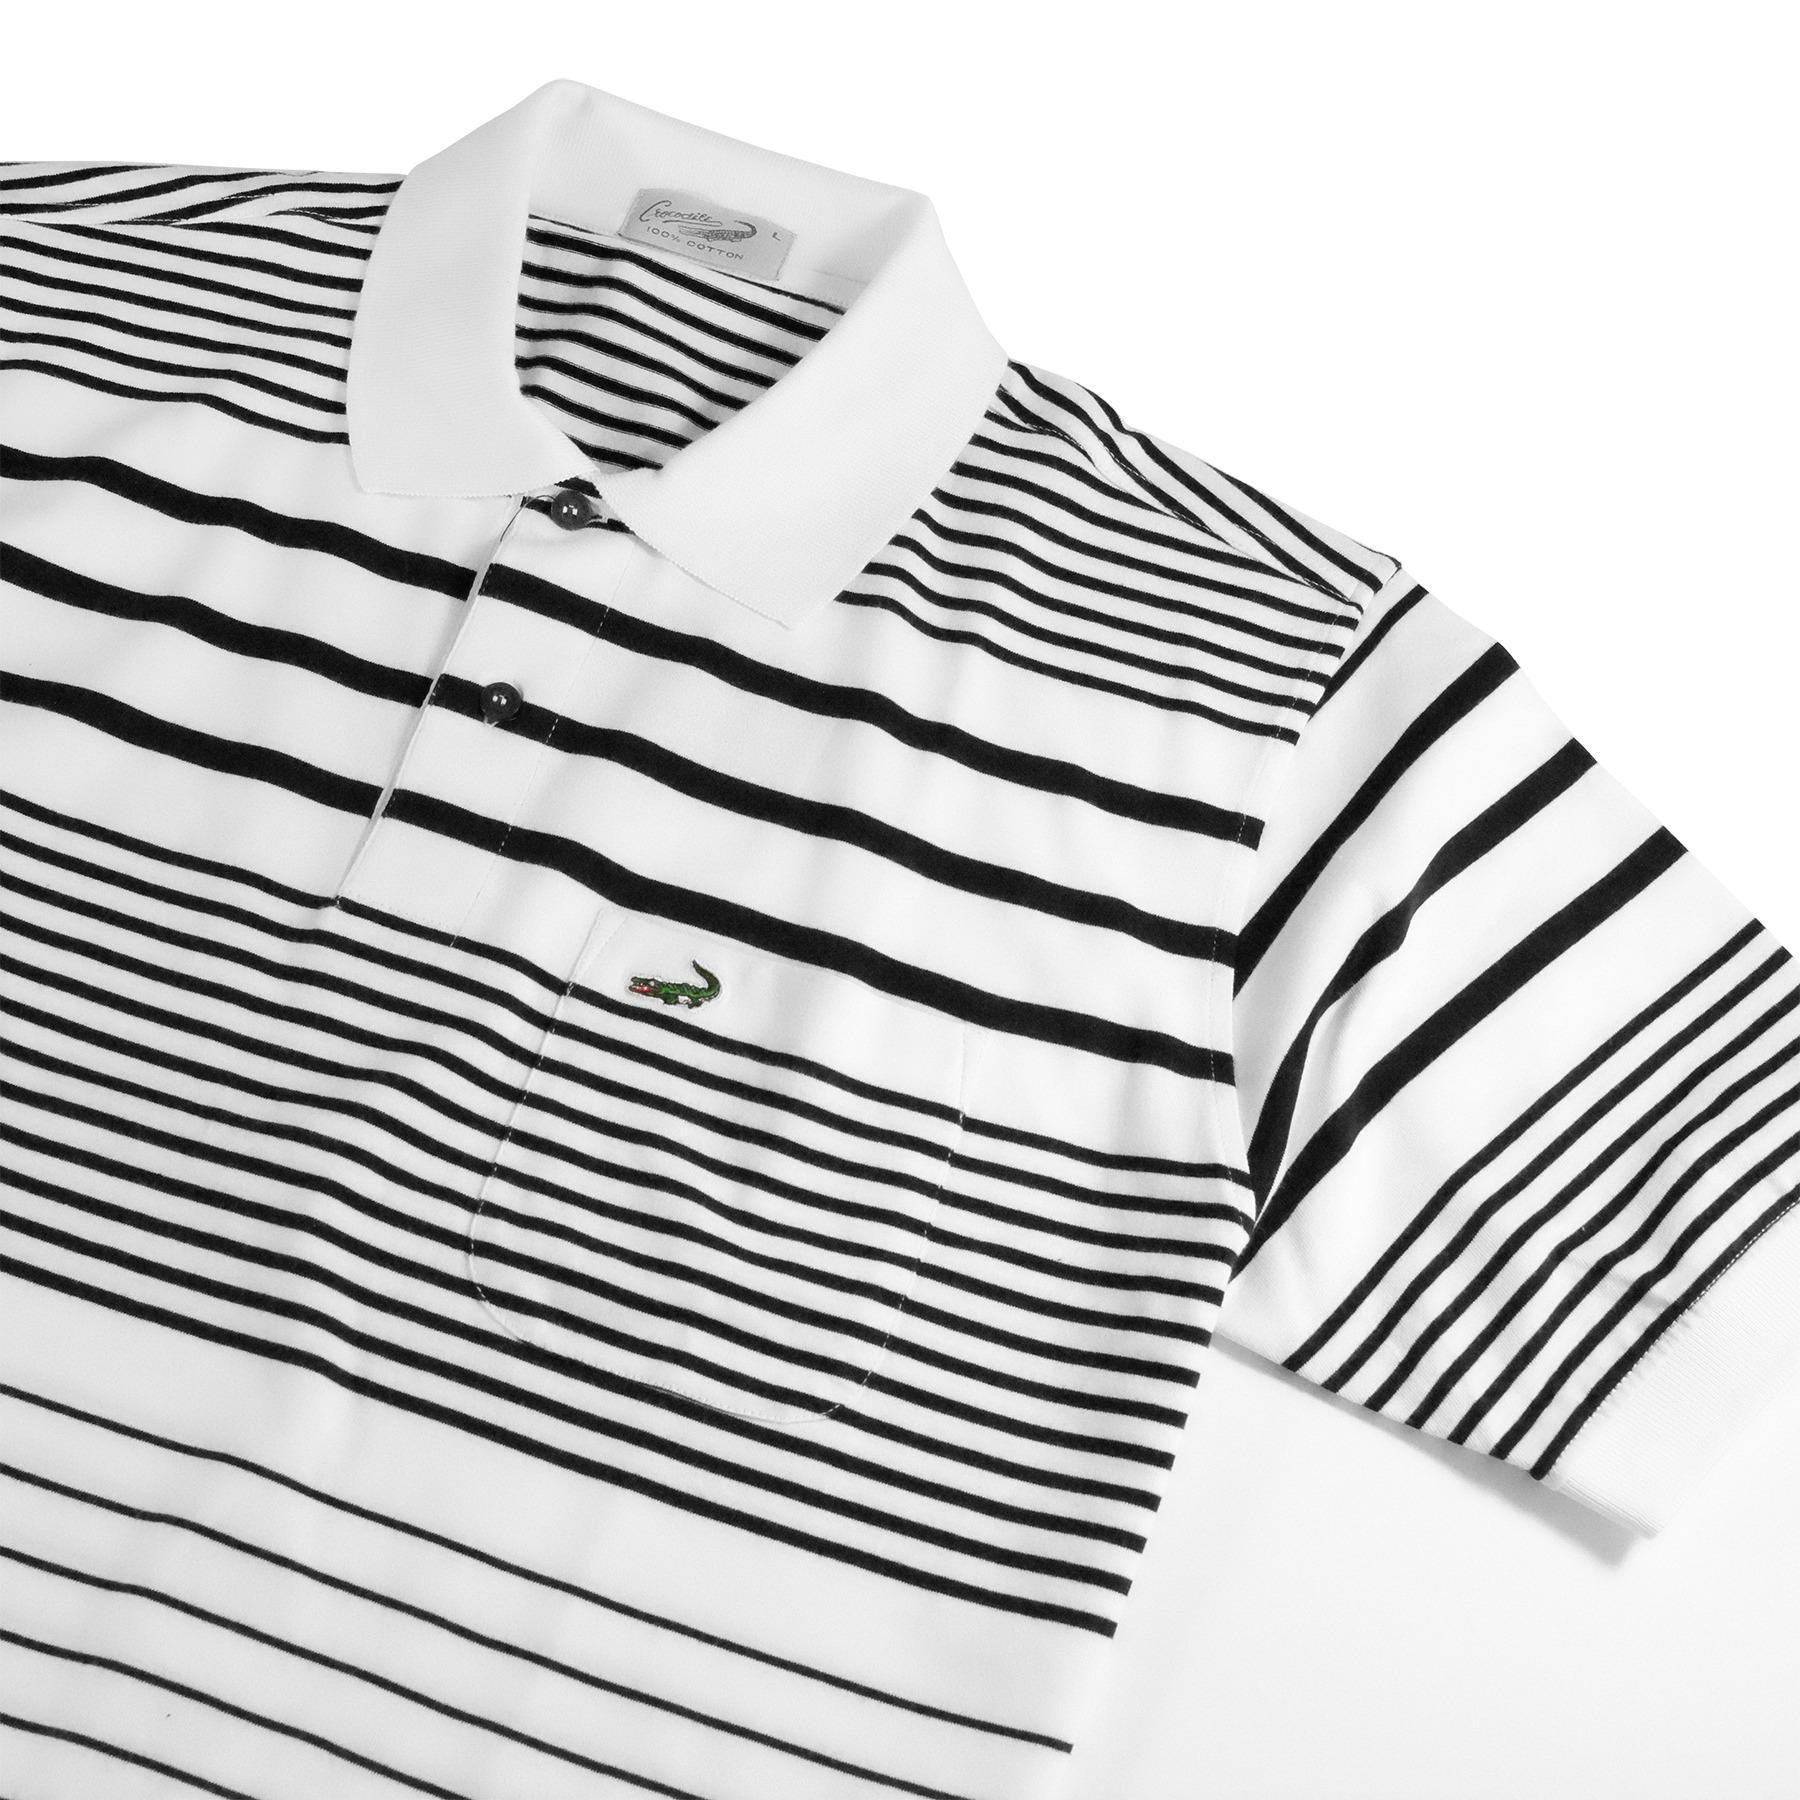 Baju Pria Crocodile Men Premium Polo Shirt Bahan Katun 100 Cotton Clas Ori Slim Fit Dark Navy S Pepe White